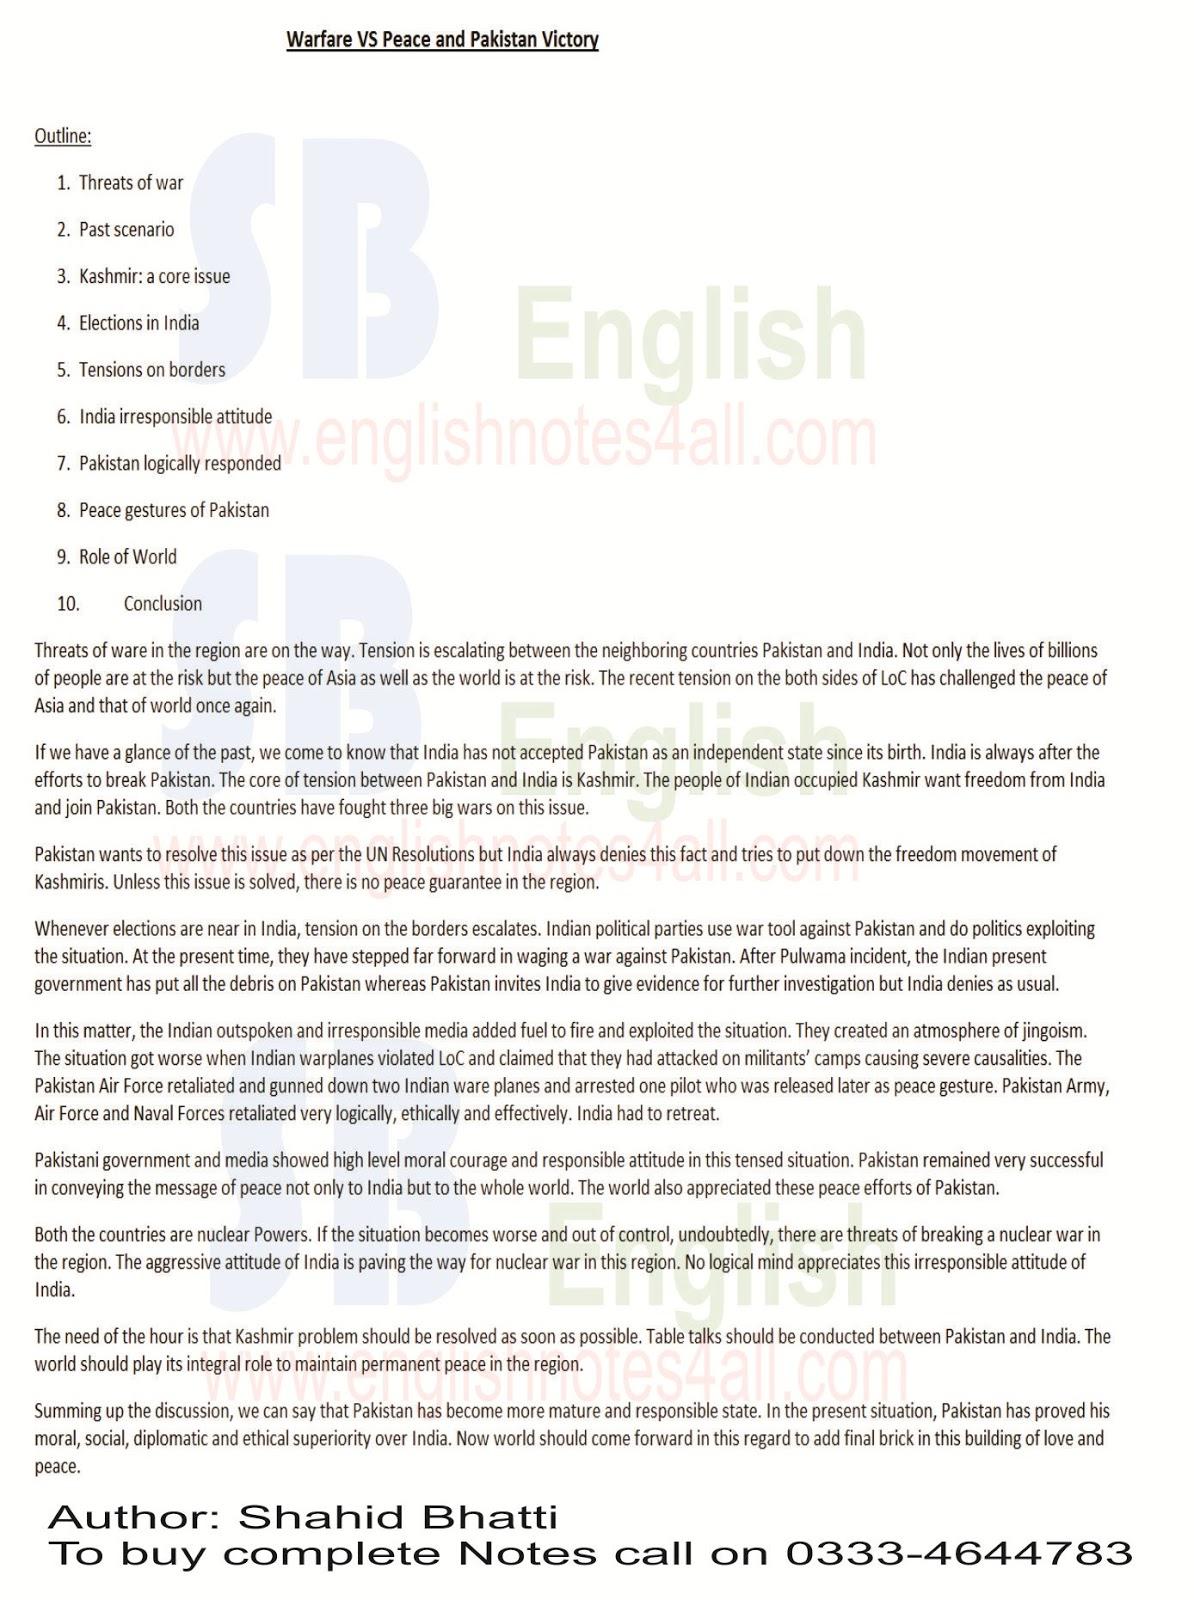 War versus peace essay college paper font